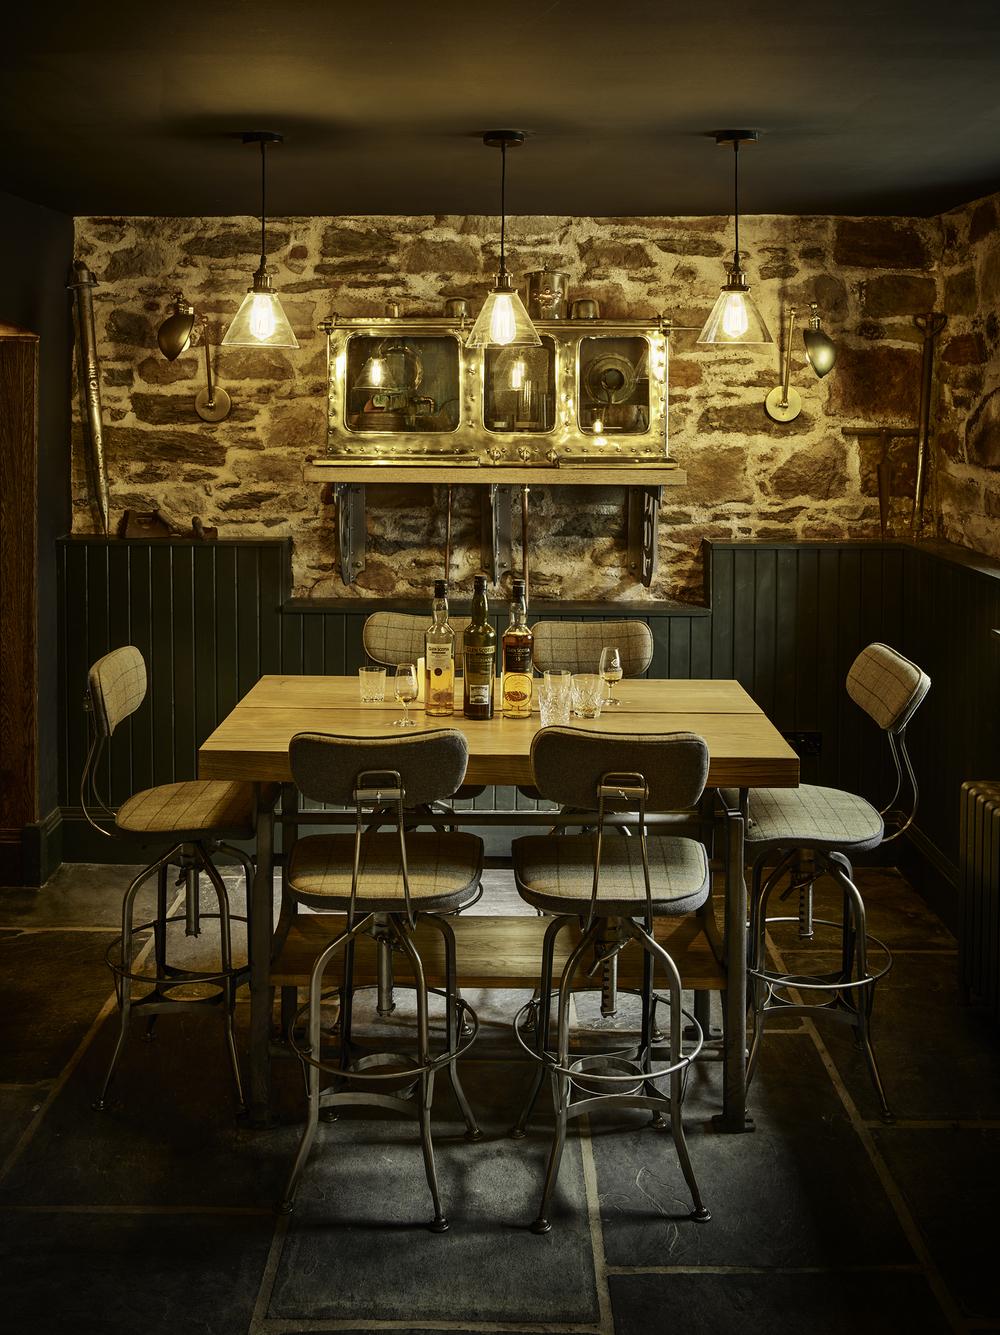 Glen Scotia Distillery Tasting Table and Spirit Safe Elevation CF001362.jpg